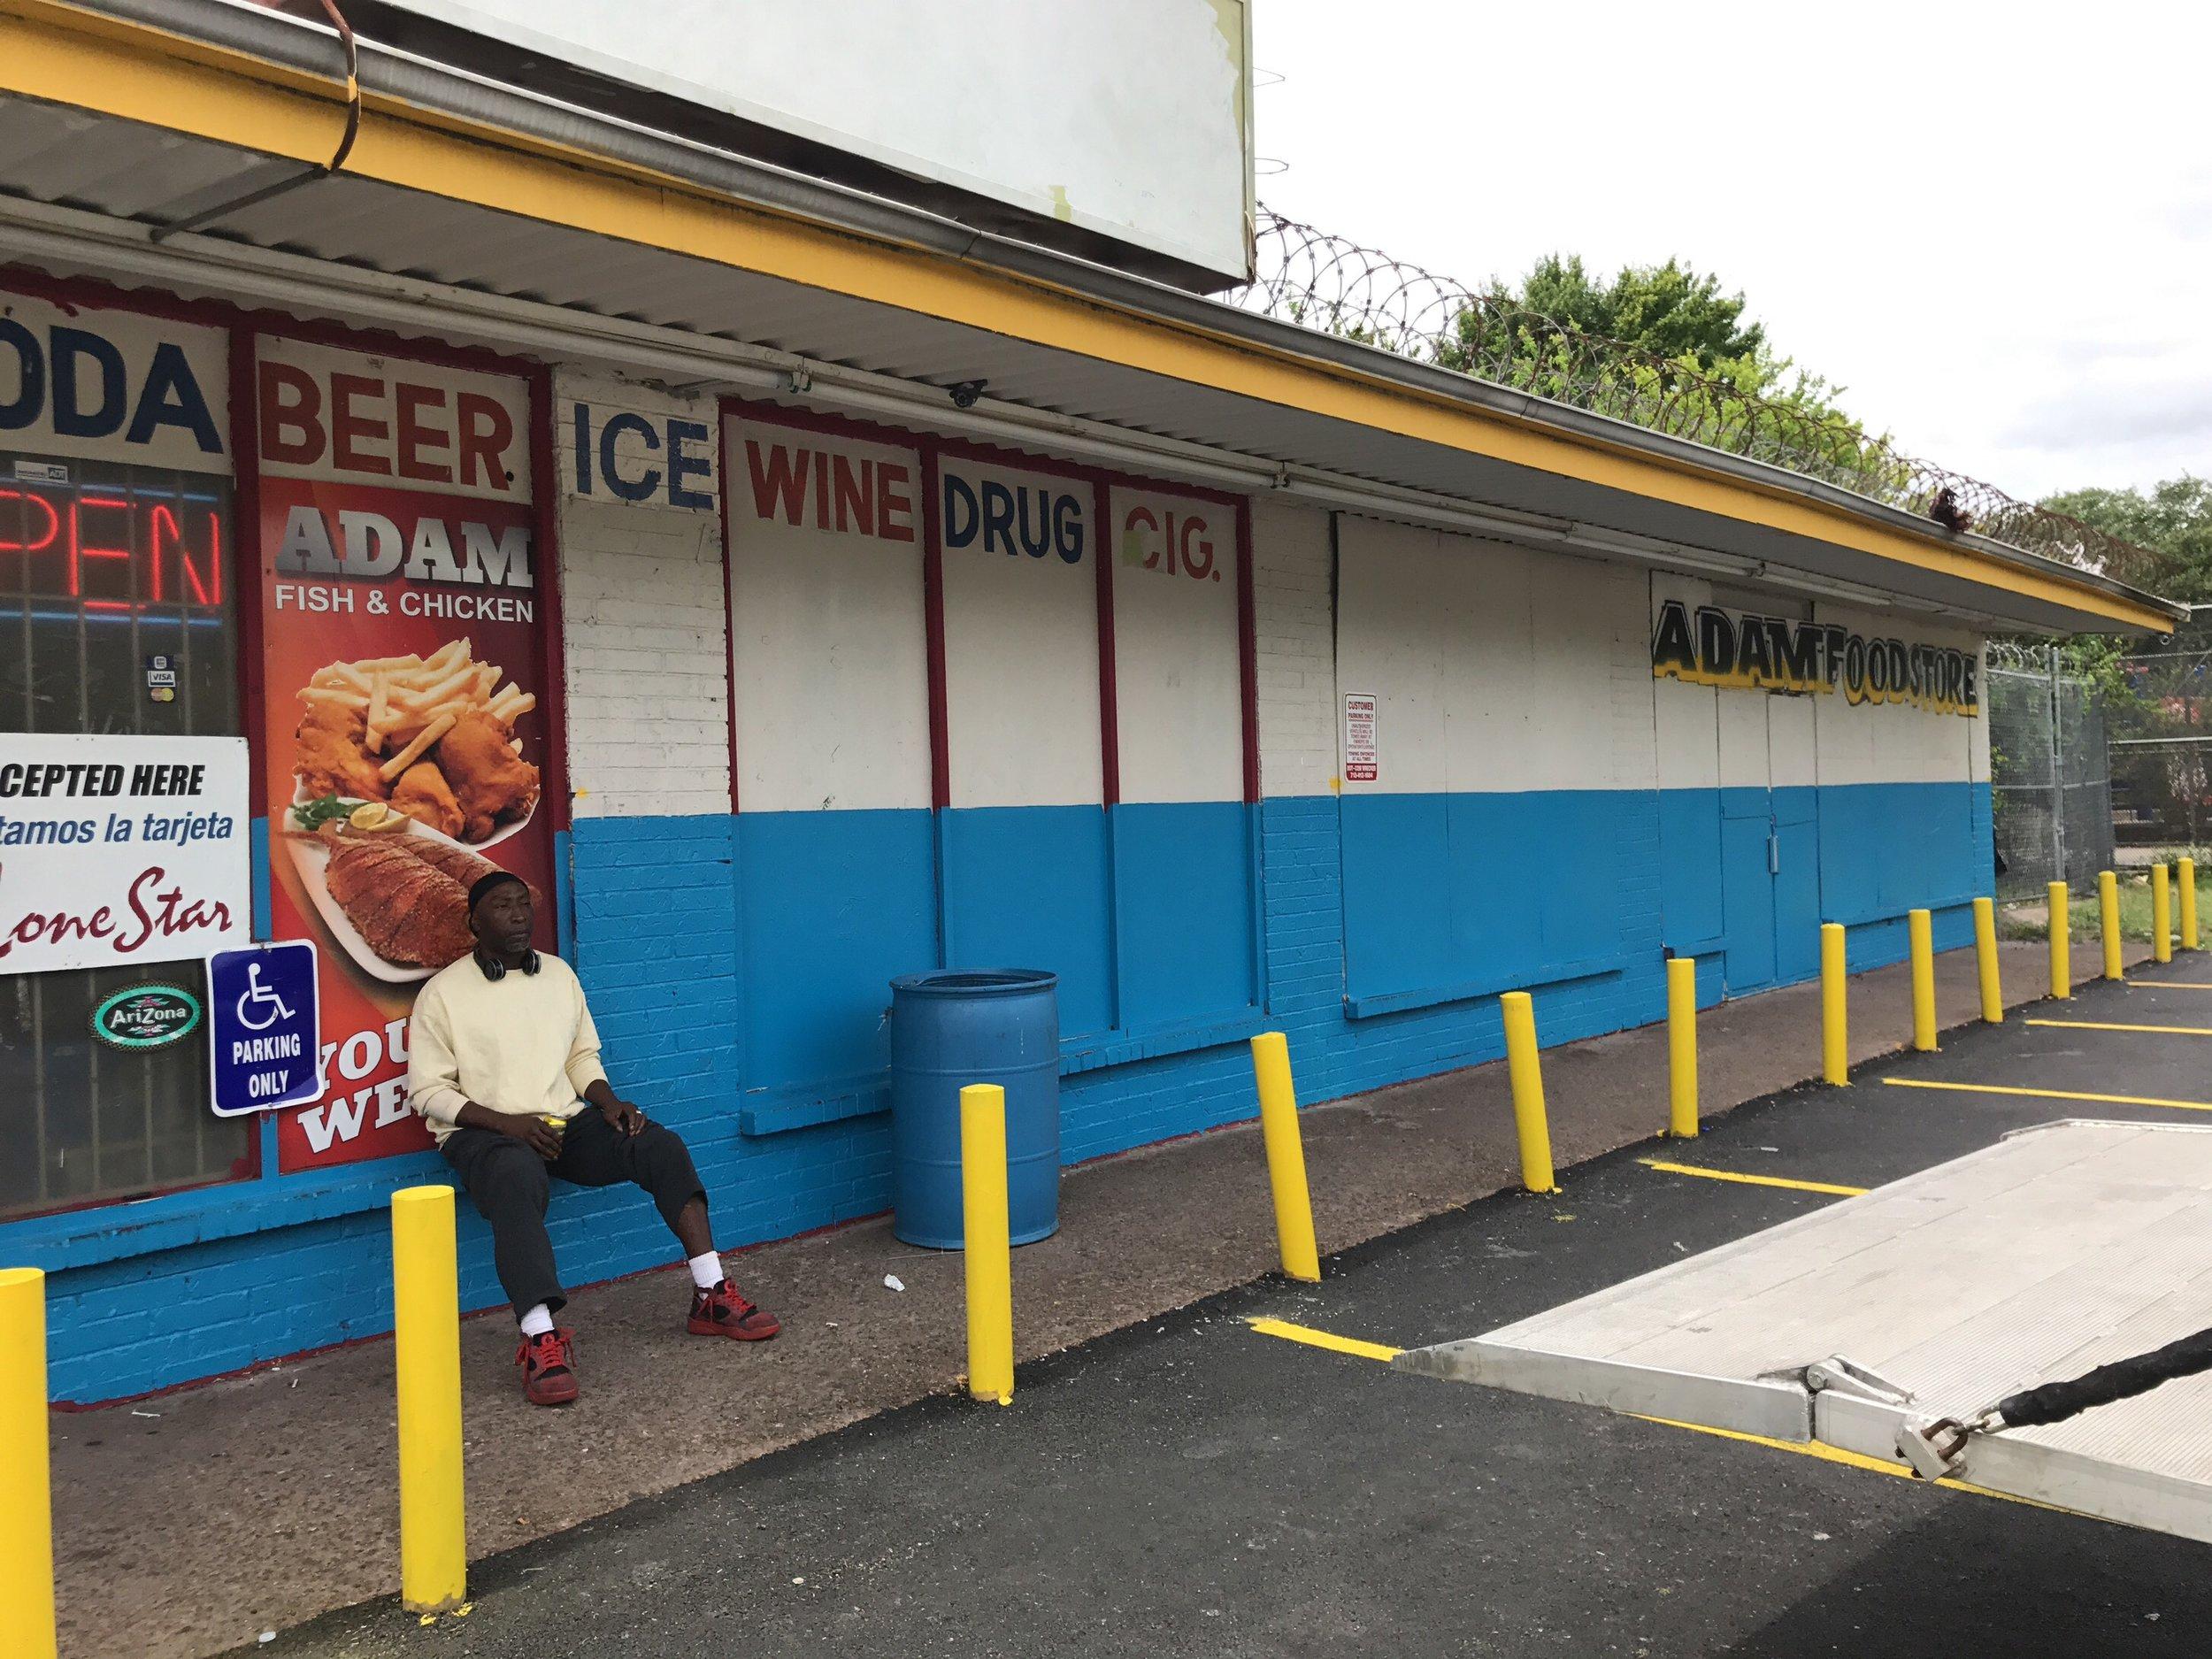 Adam Food Store Houston TX (1).jpeg